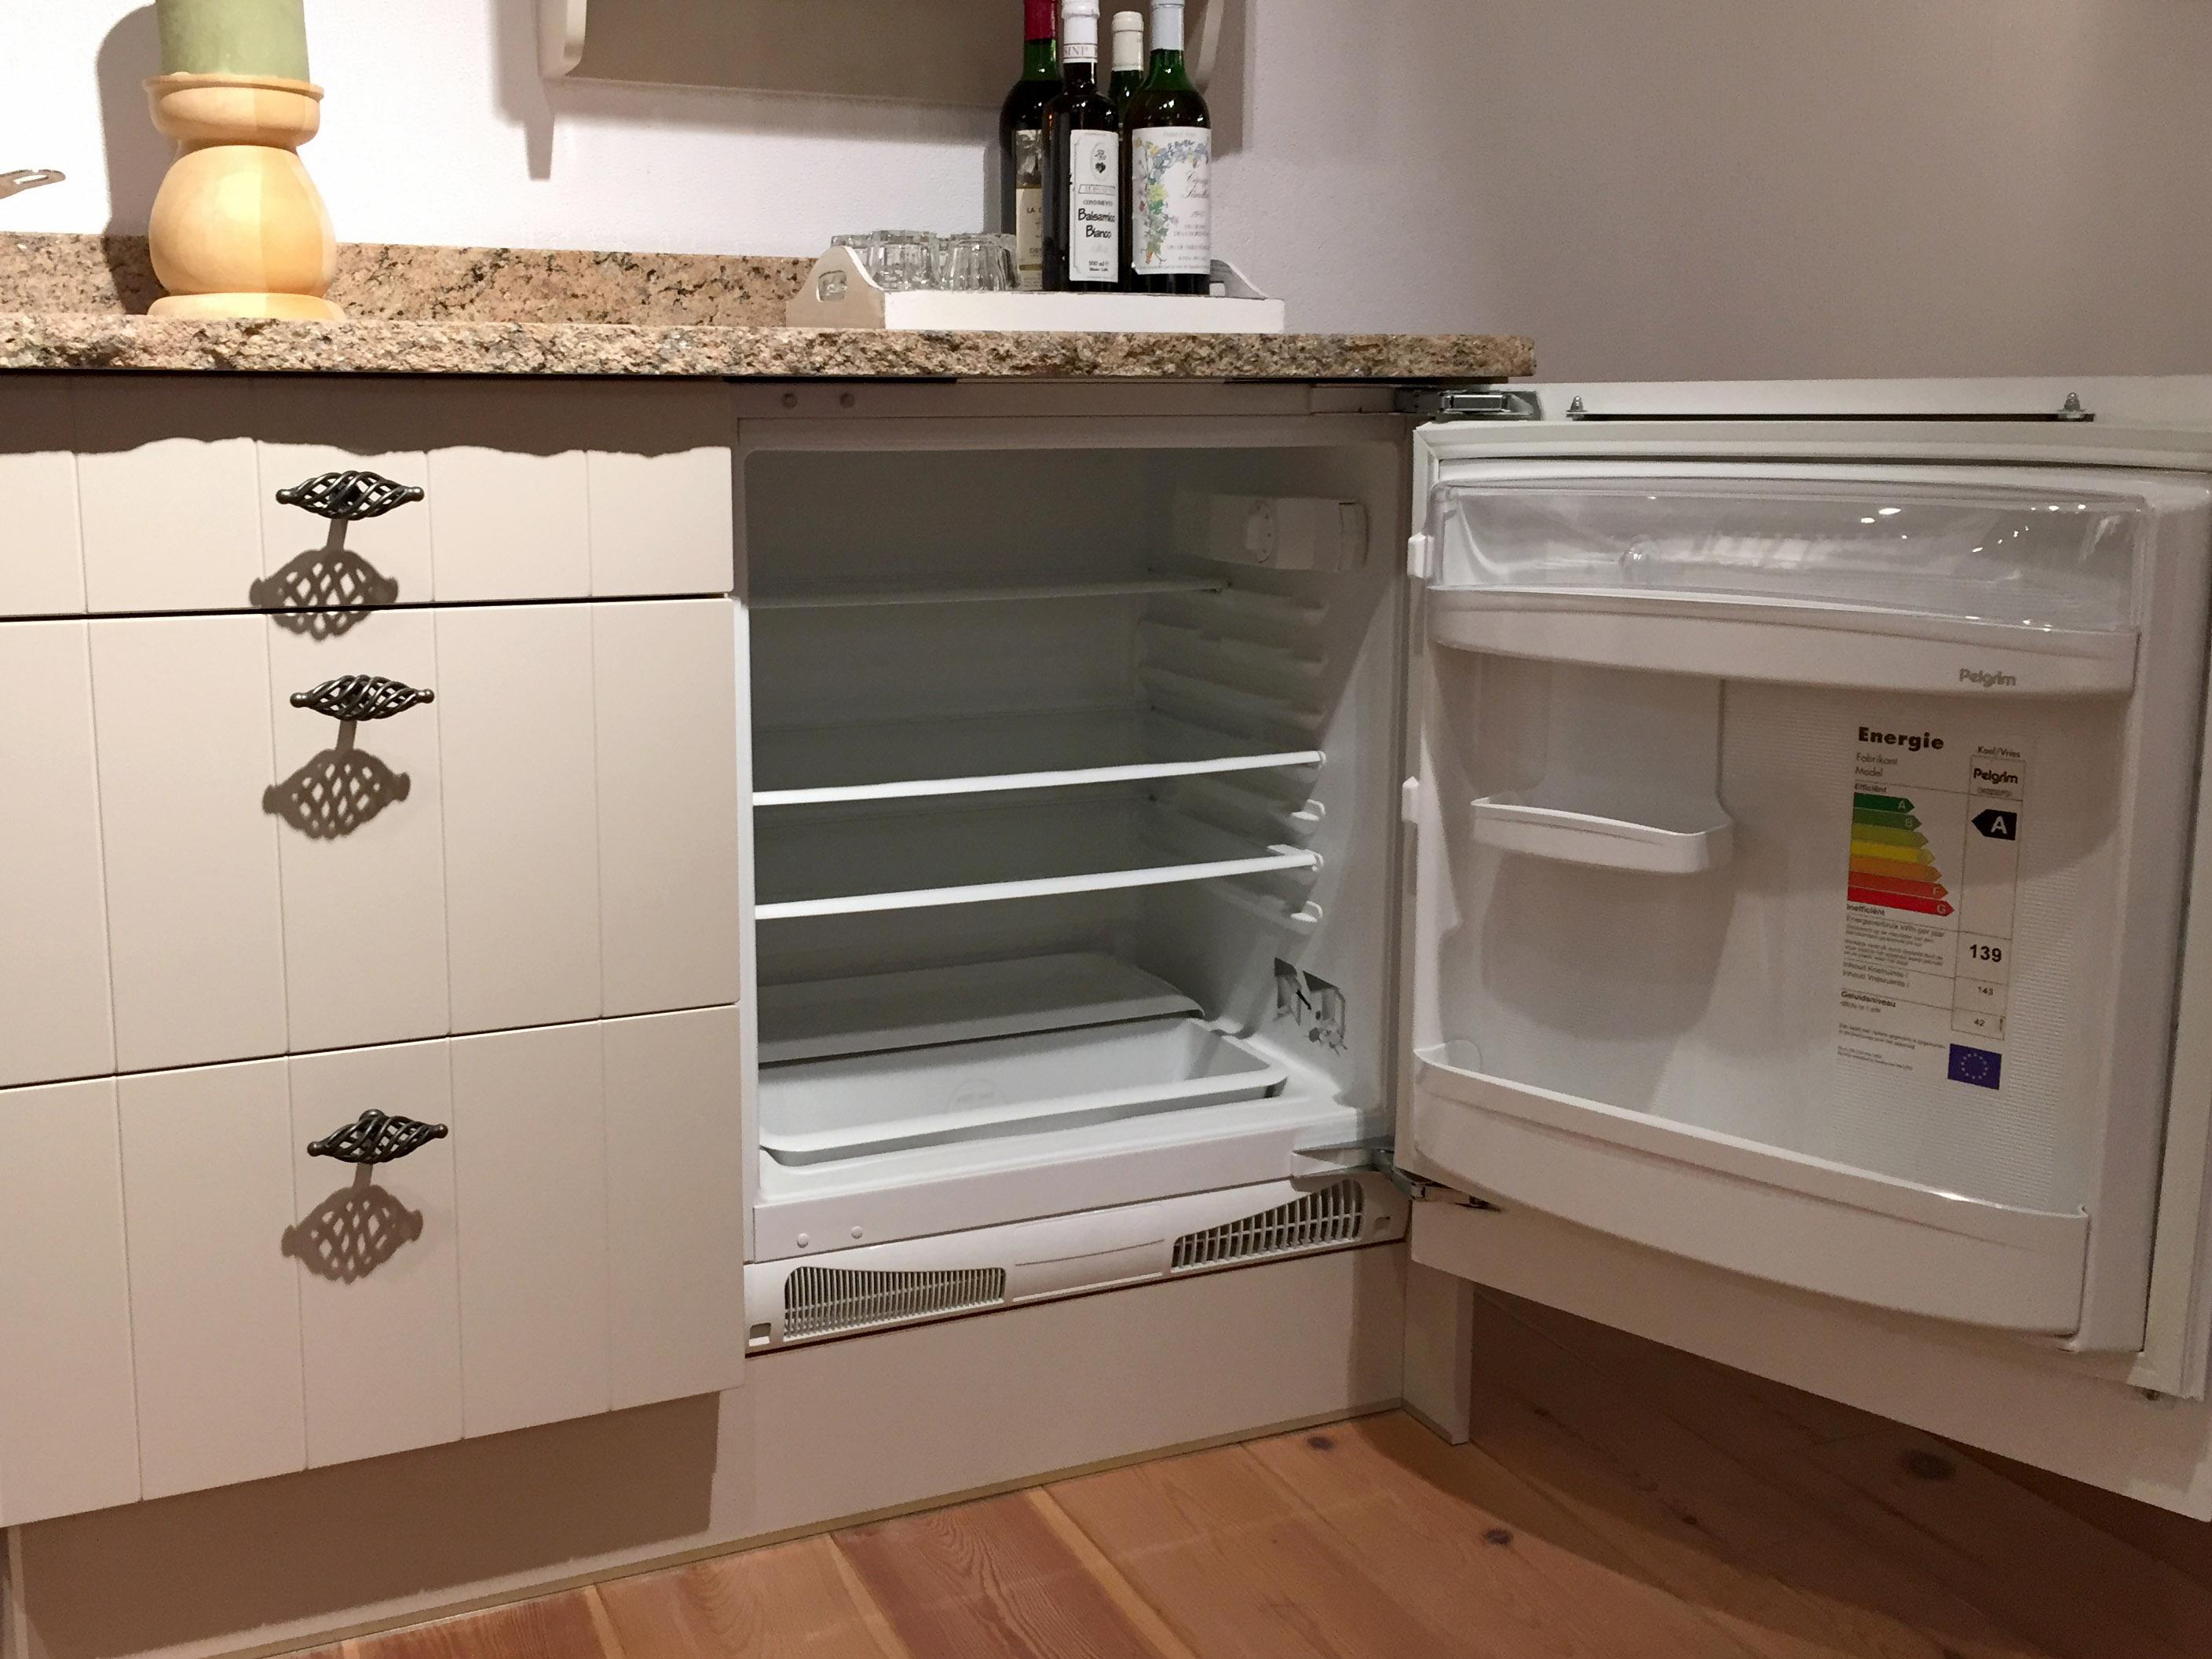 Boretti Keuken Galerij : Showroom keuken beige hoefnagel tegels keukens en sanitair